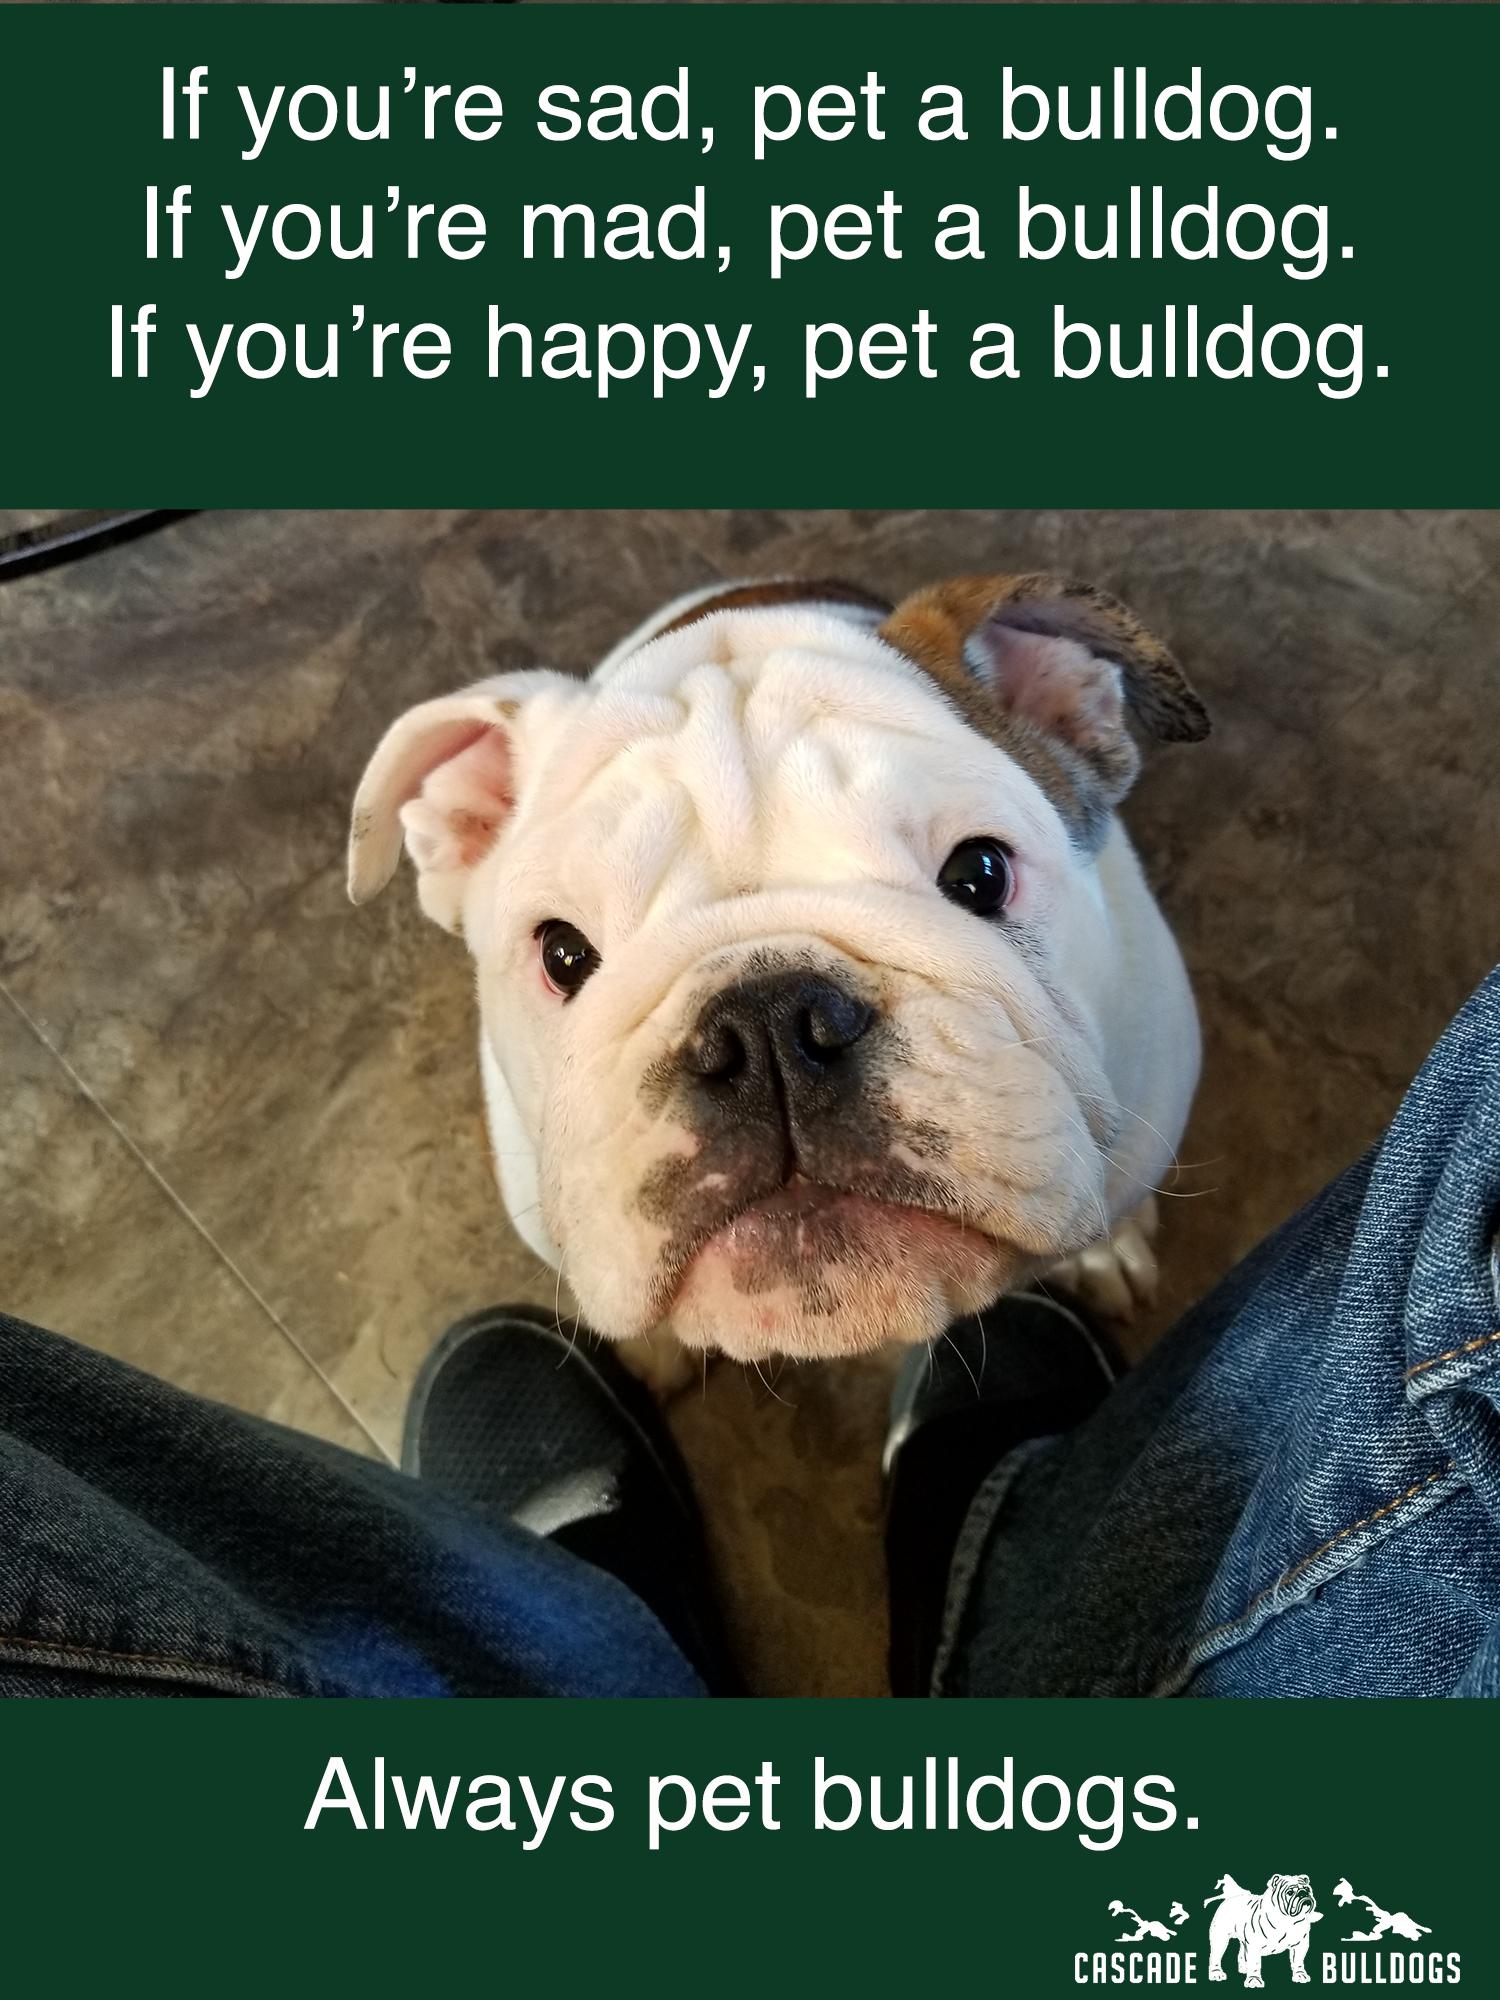 Always Pet Bulldogs Http Cascadebulldogs Com Bulldog Funny Animals Funny Dog Memes